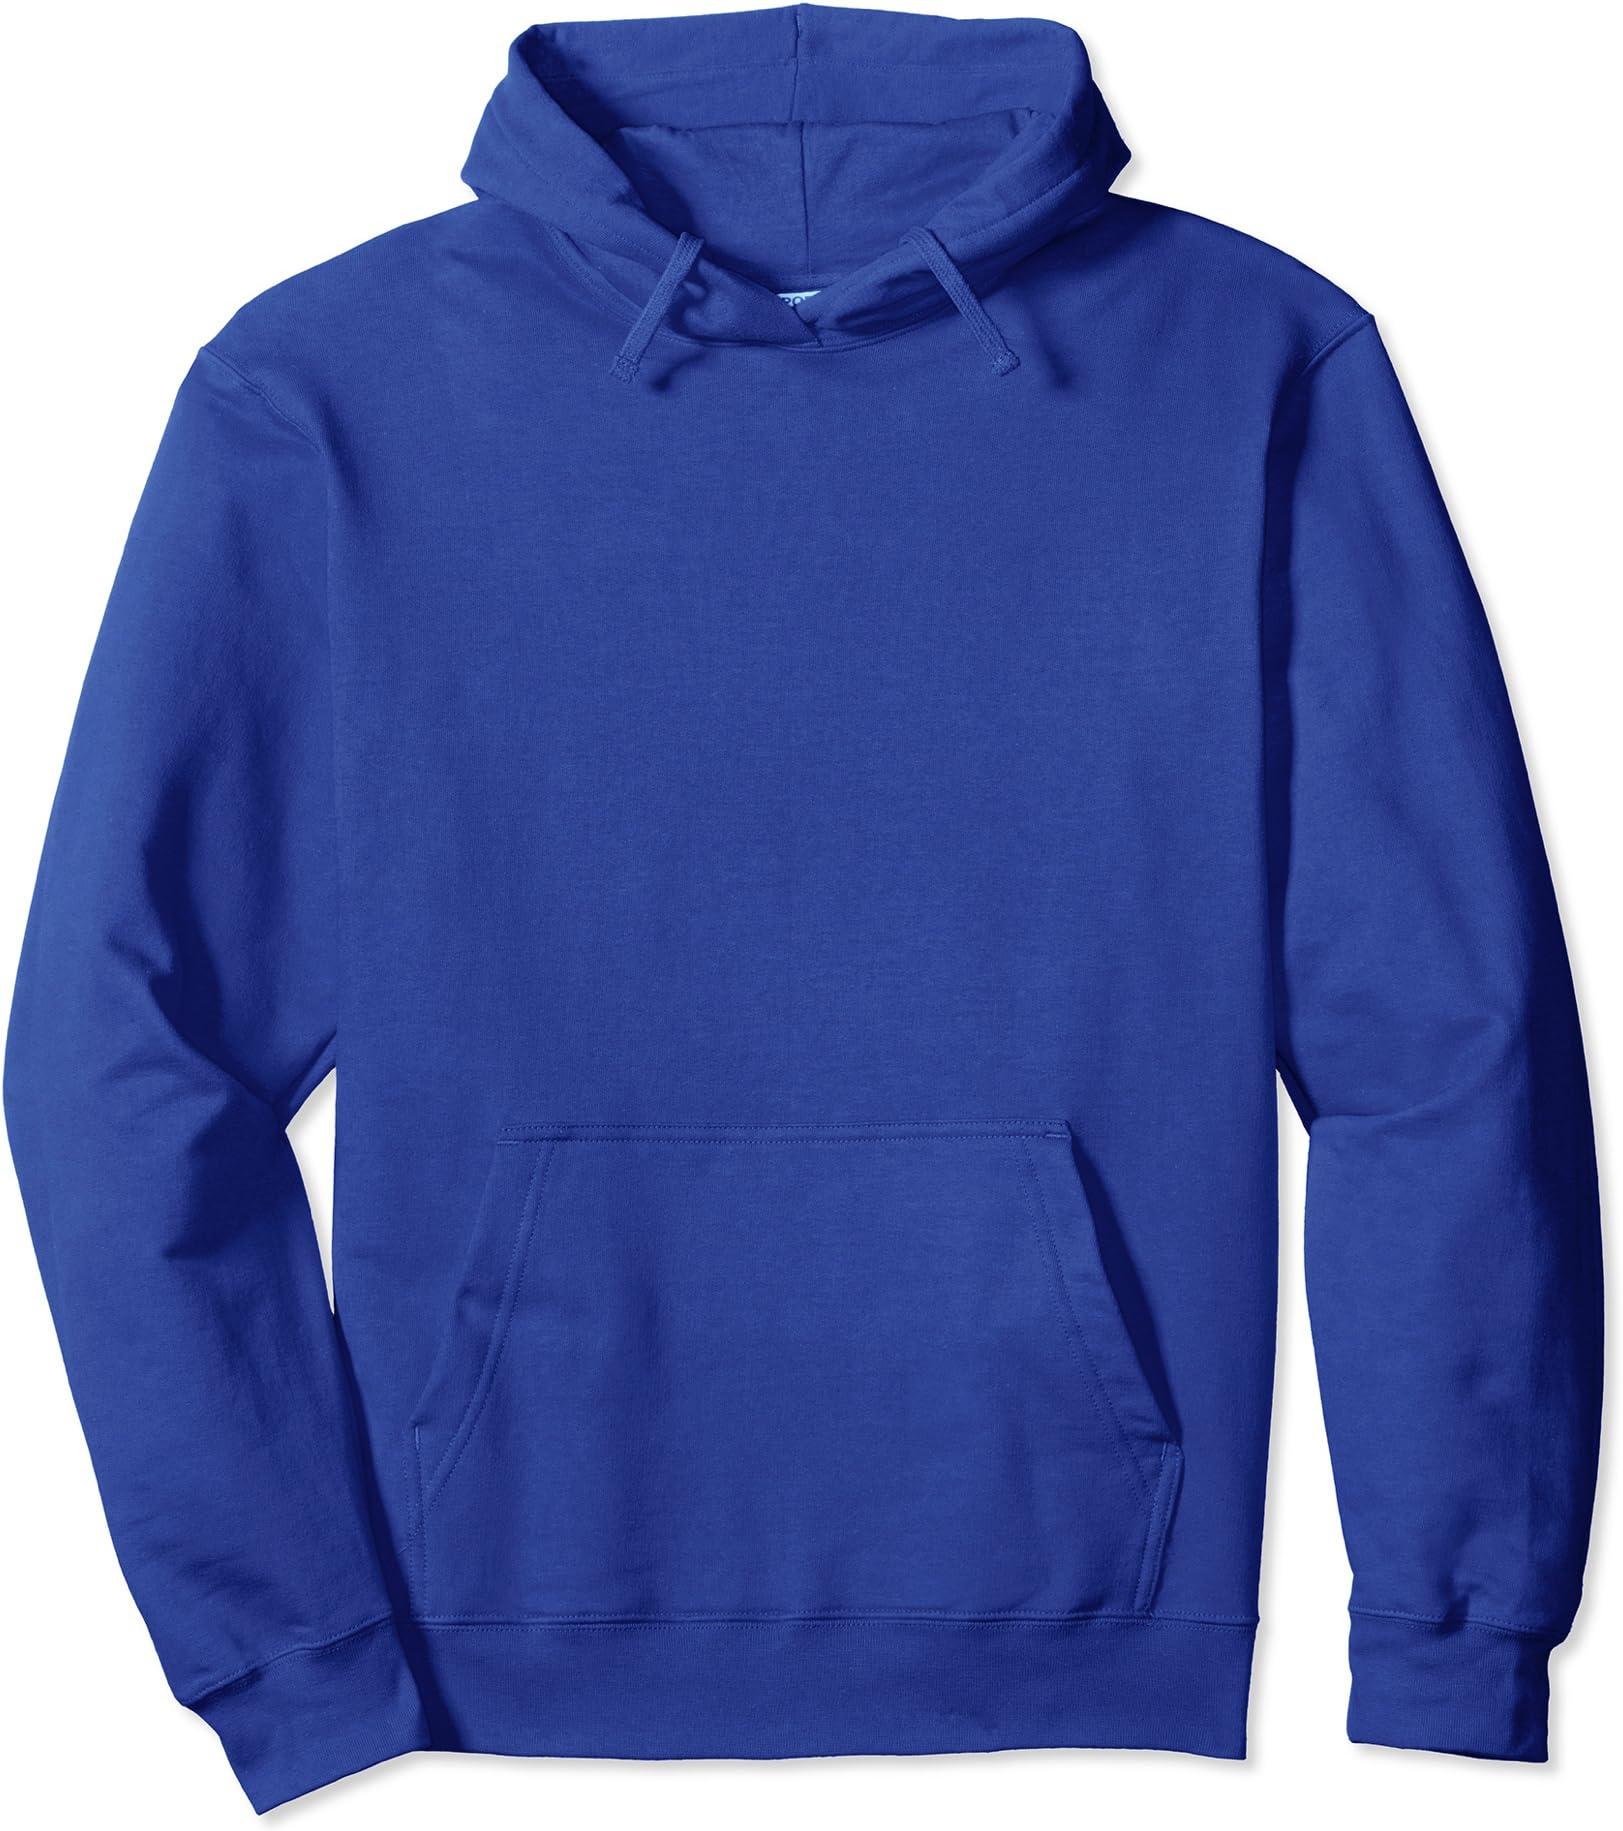 CRYYU Women Gothic Punk Long Sleeve Zip Front Plus Size Sweatshirts Hoodies Tops